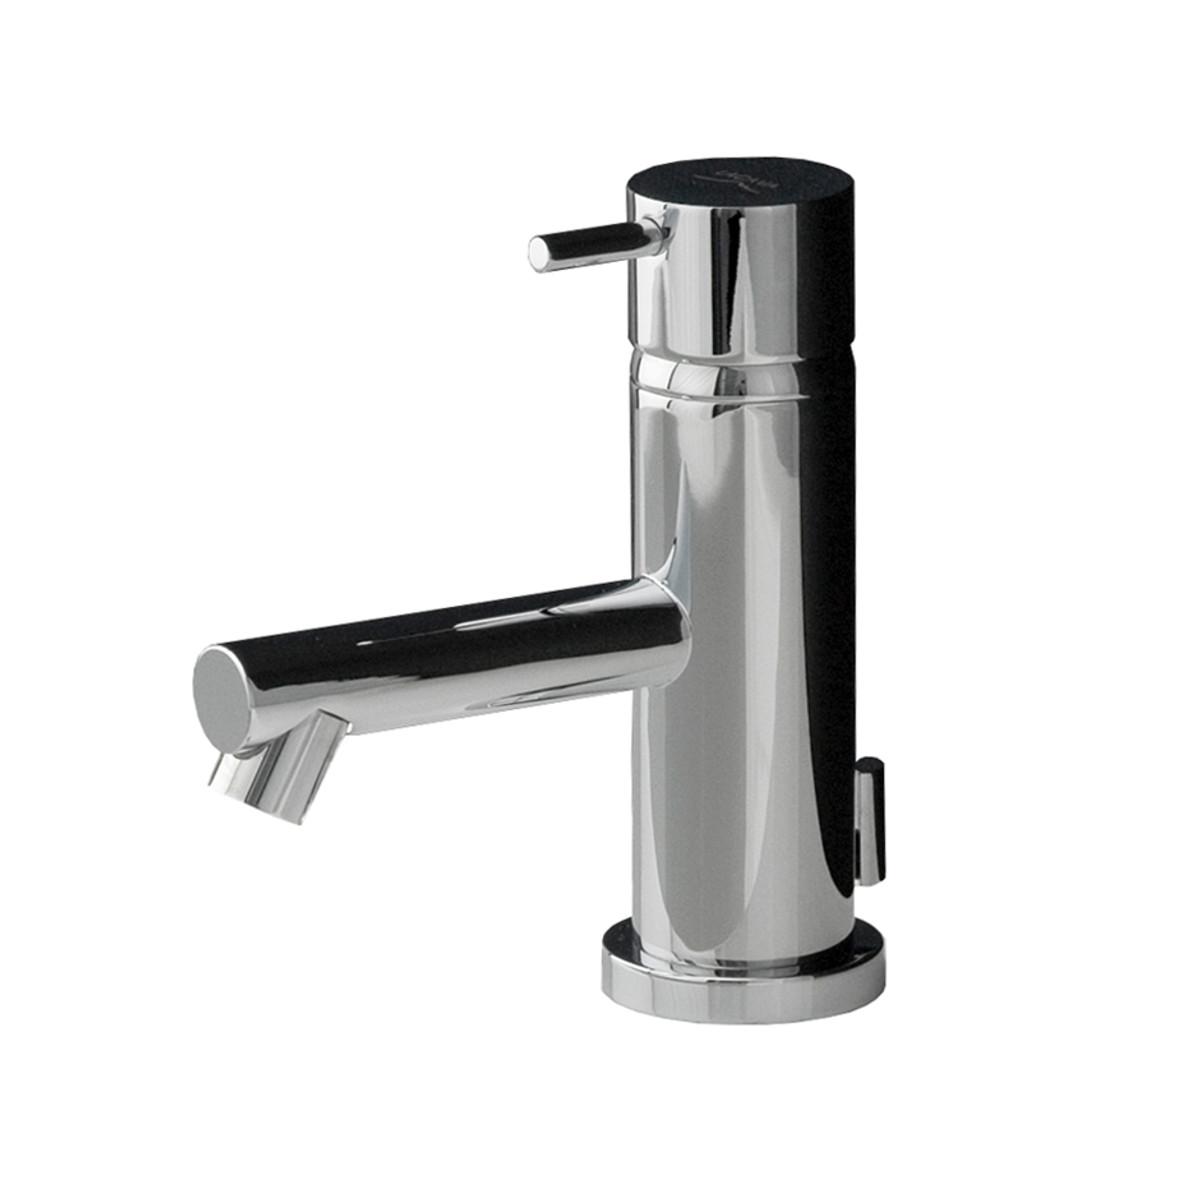 0110L Minimal Deck Faucet